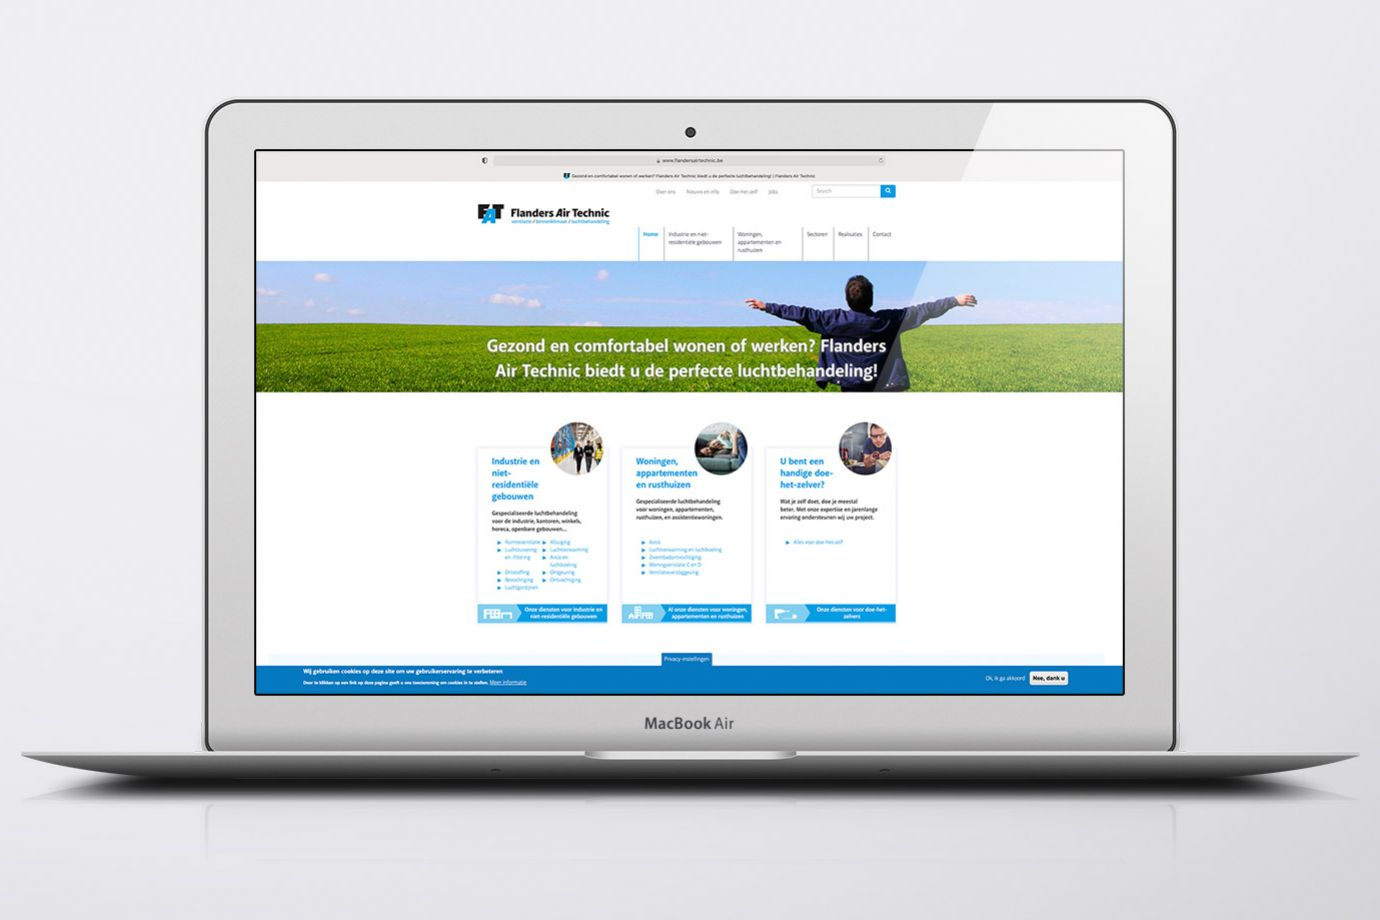 Flanders Air Technic website